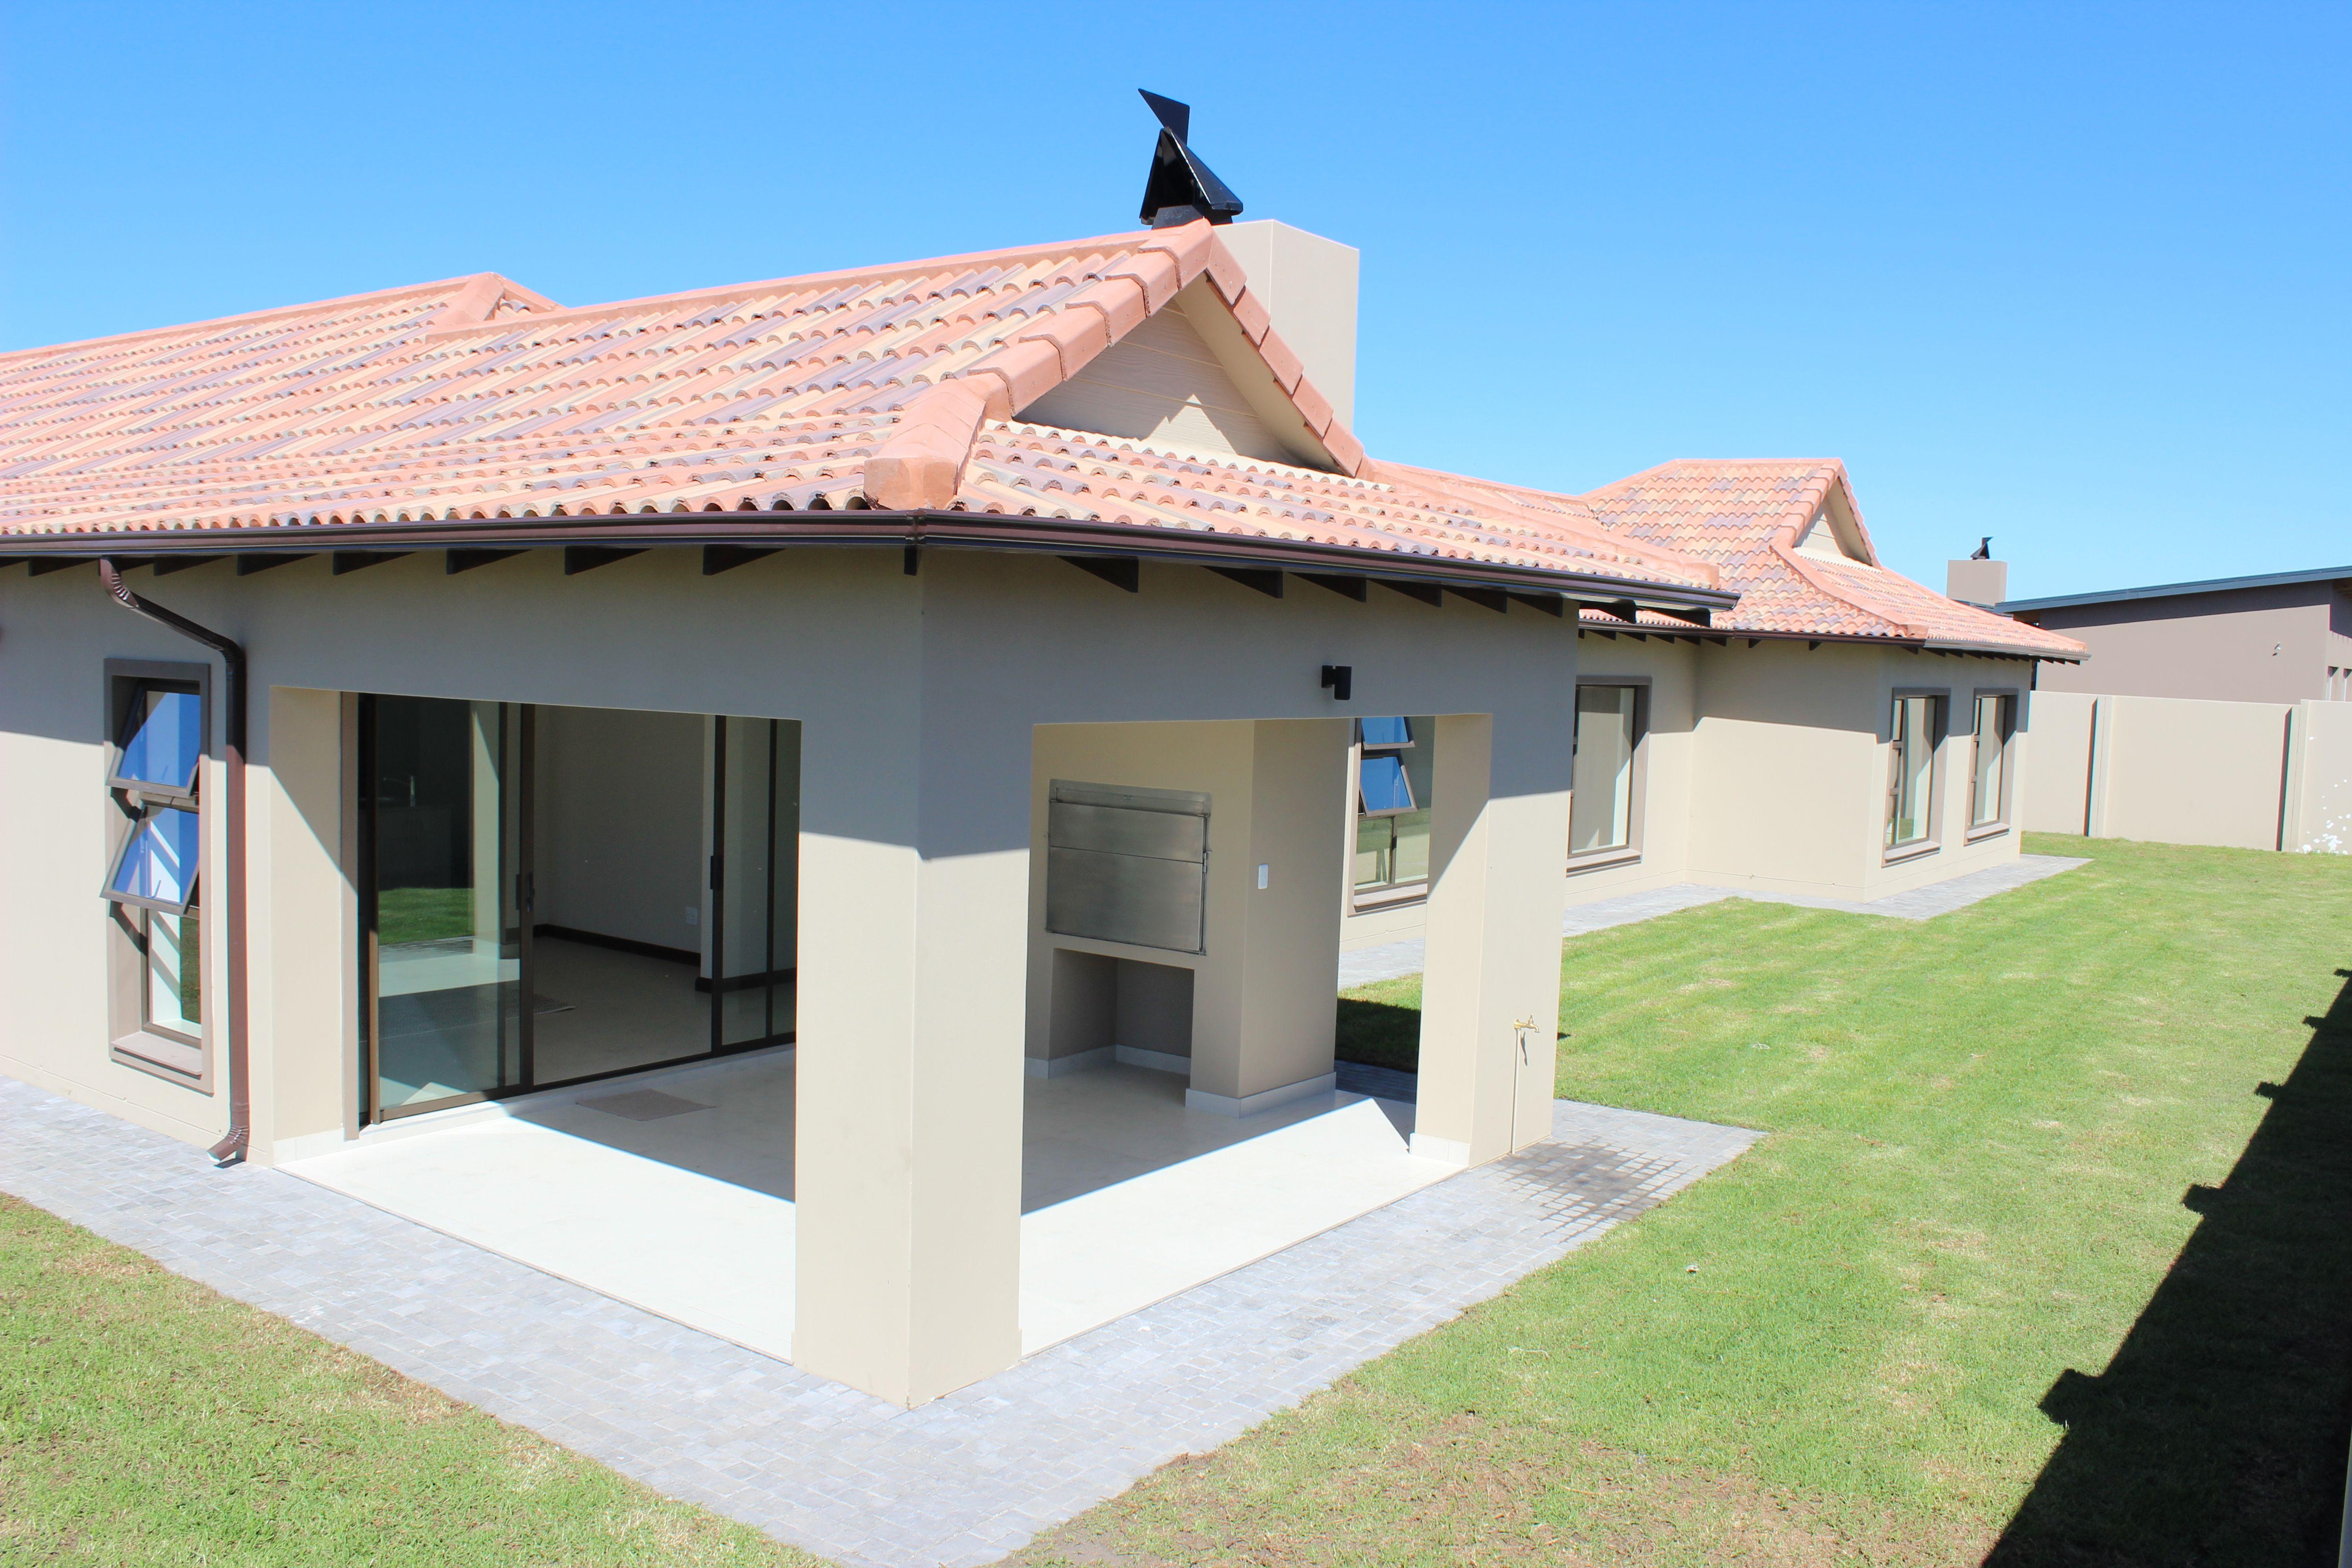 Bali Style House, 4 Bedroom, 3 Bathrooms, open plan ...